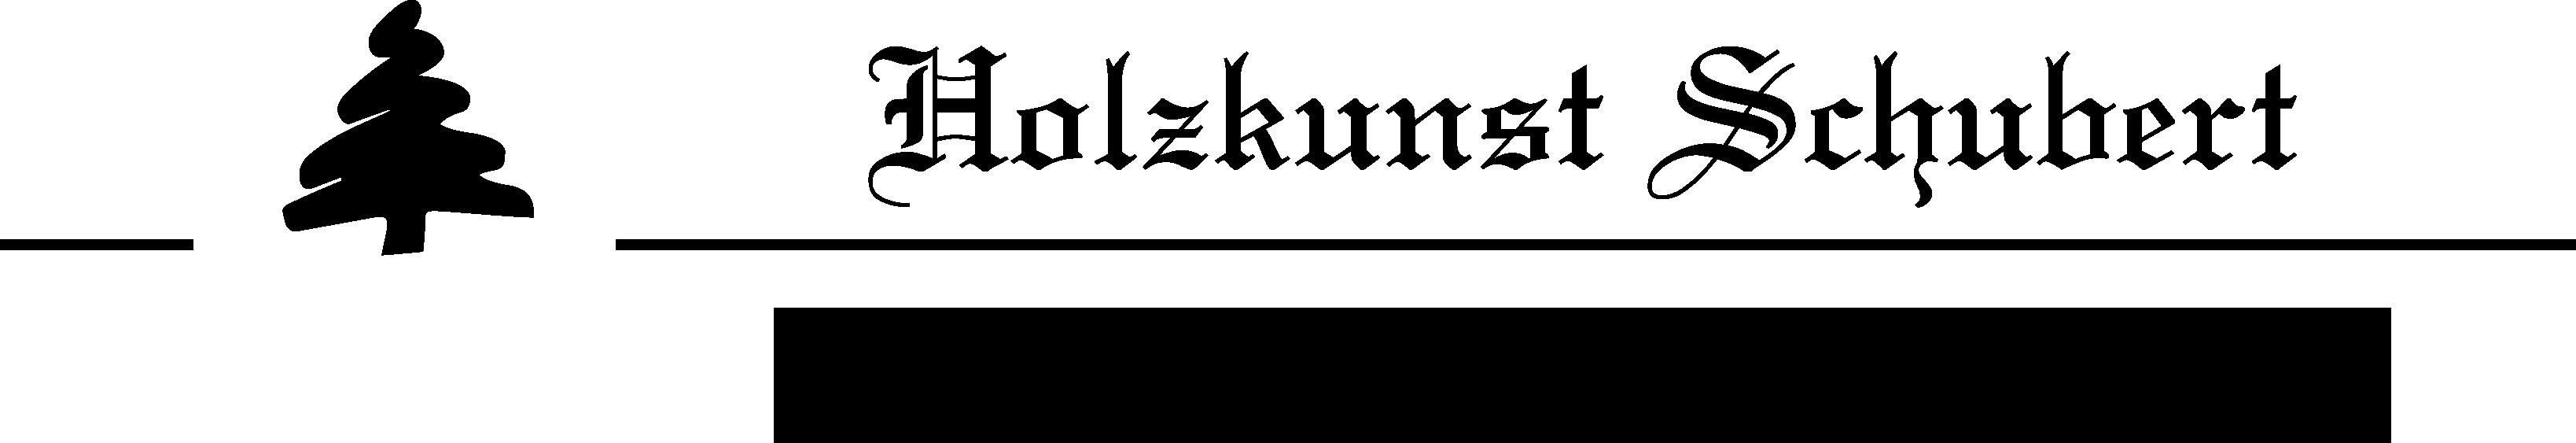 Holzkunst Schubert